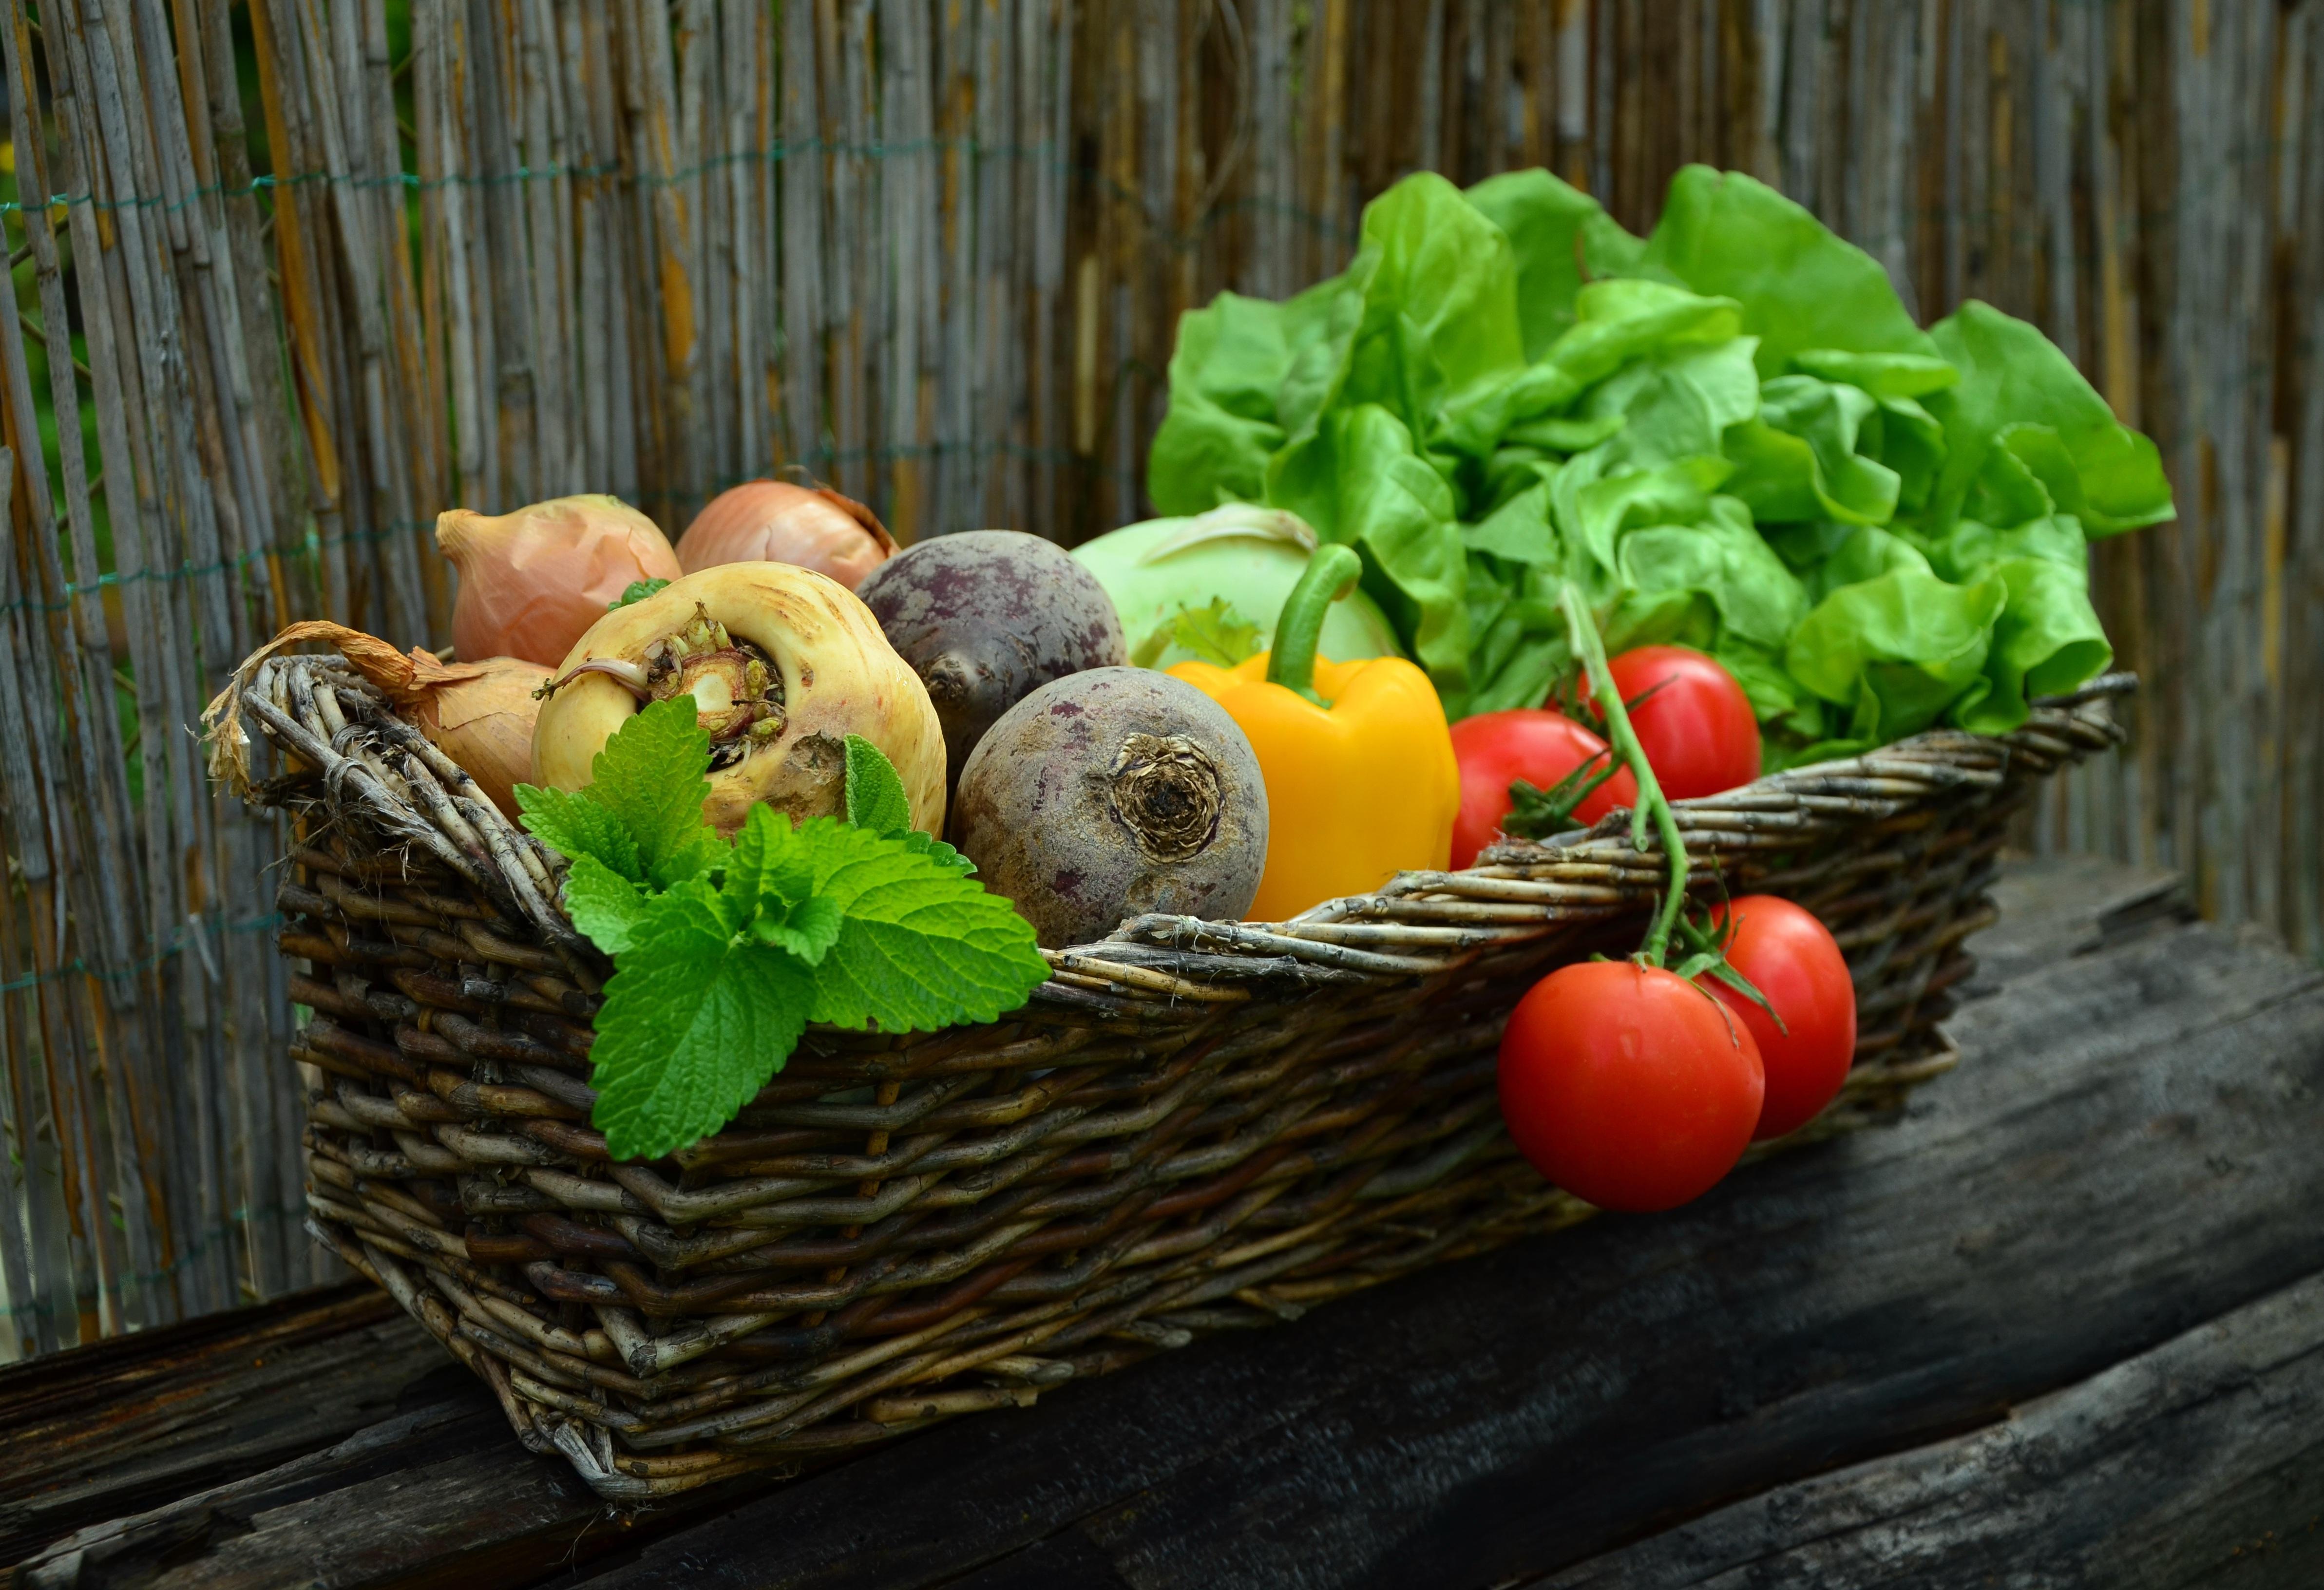 66933 Заставки и Обои Овощи на телефон. Скачать Еда, Овощи, Зелень, Корзина, Свекла, Редька картинки бесплатно